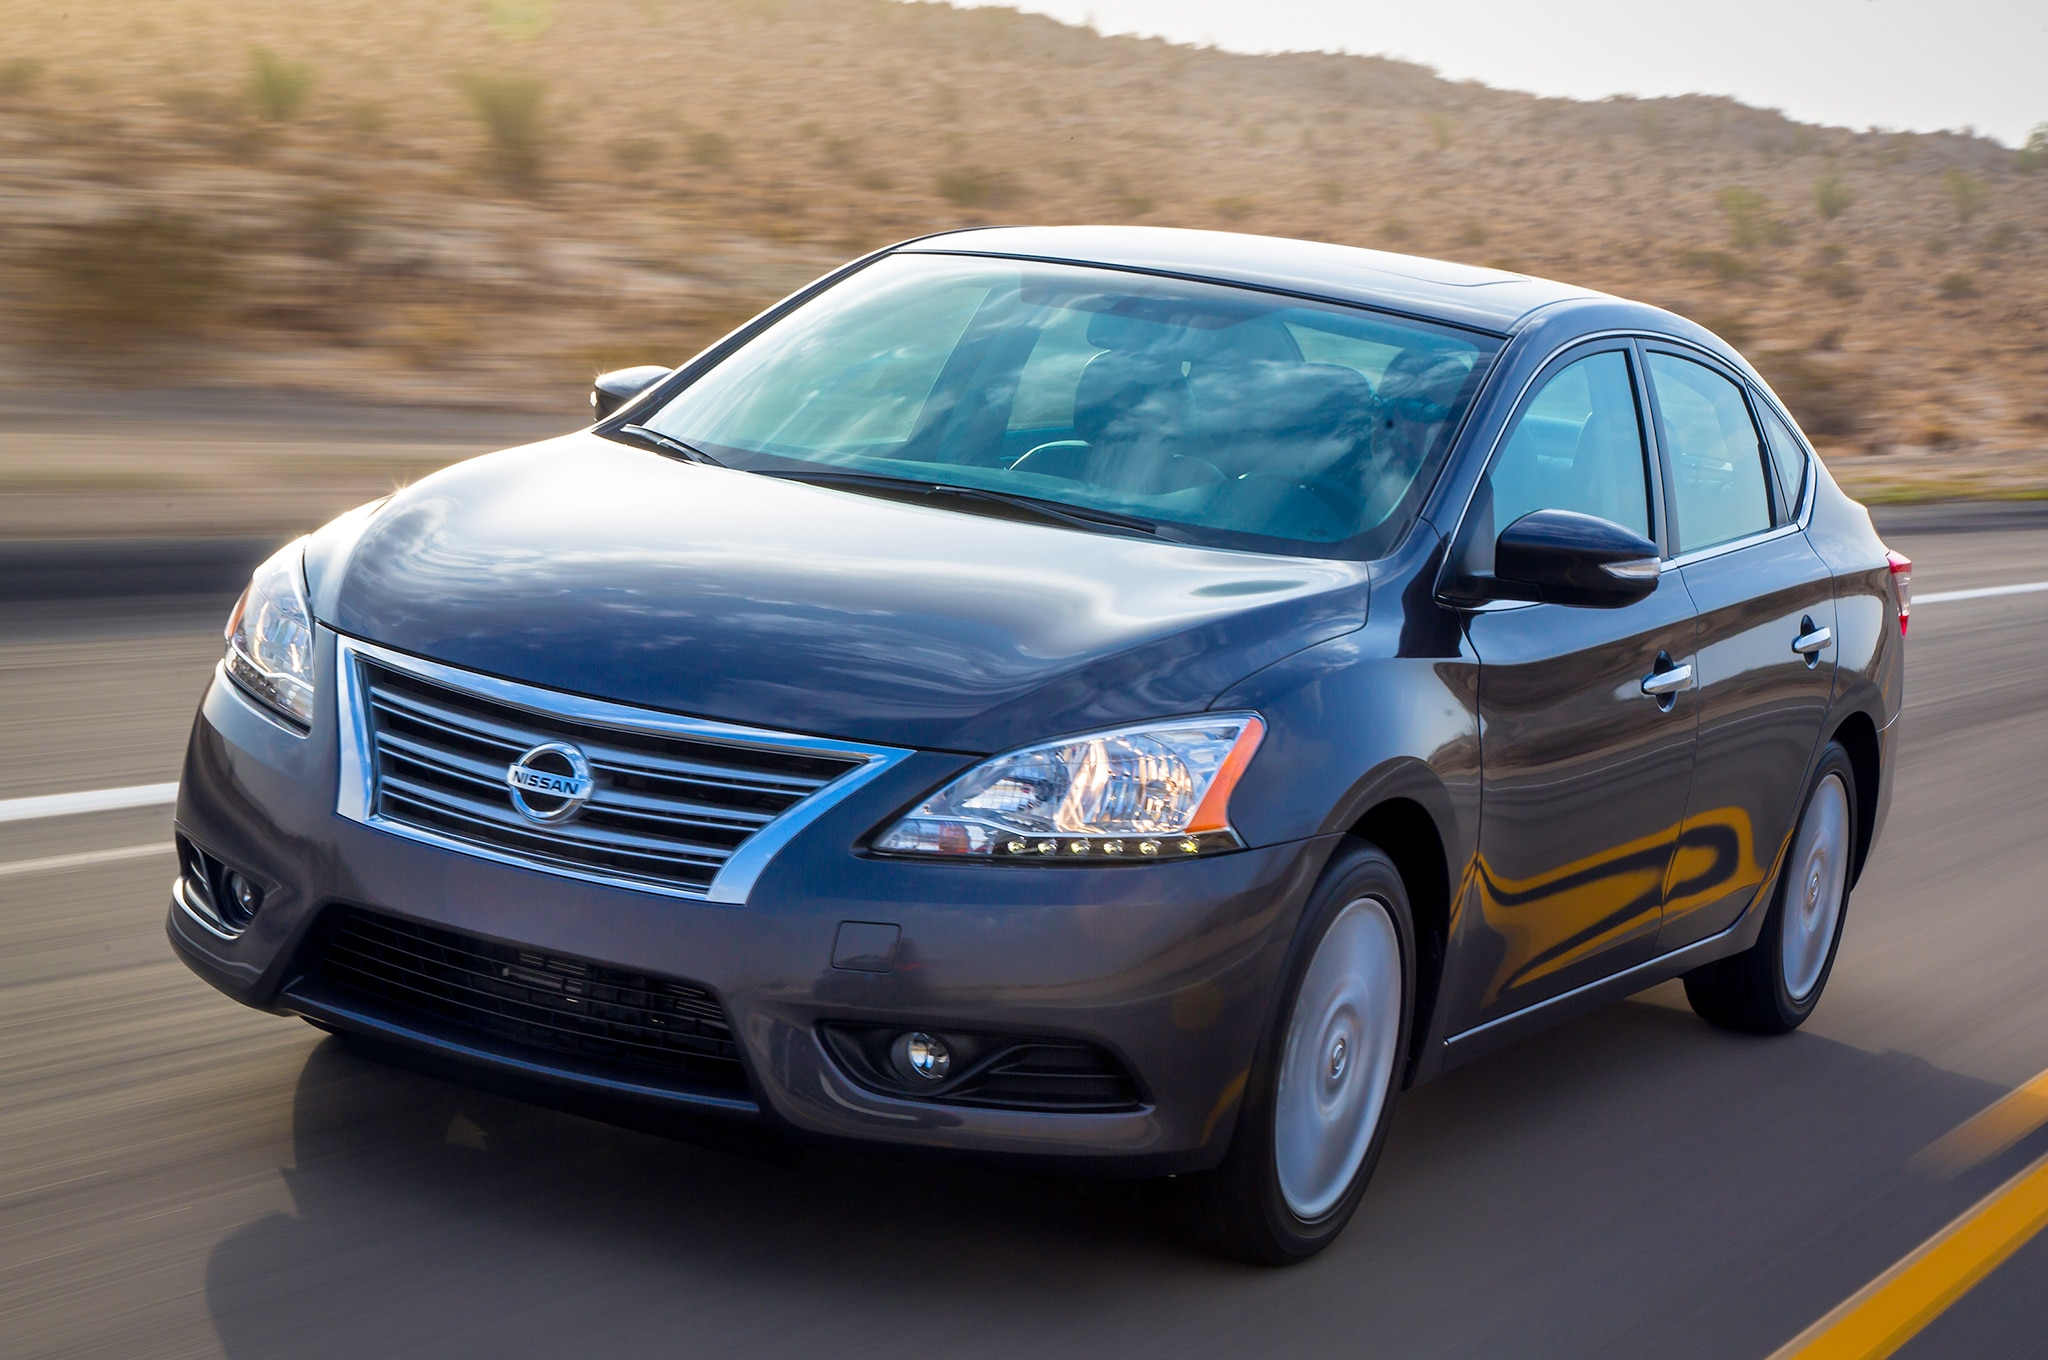 2013 Nissan Sentra SR - Editors' Notebook - Automobile Magazine